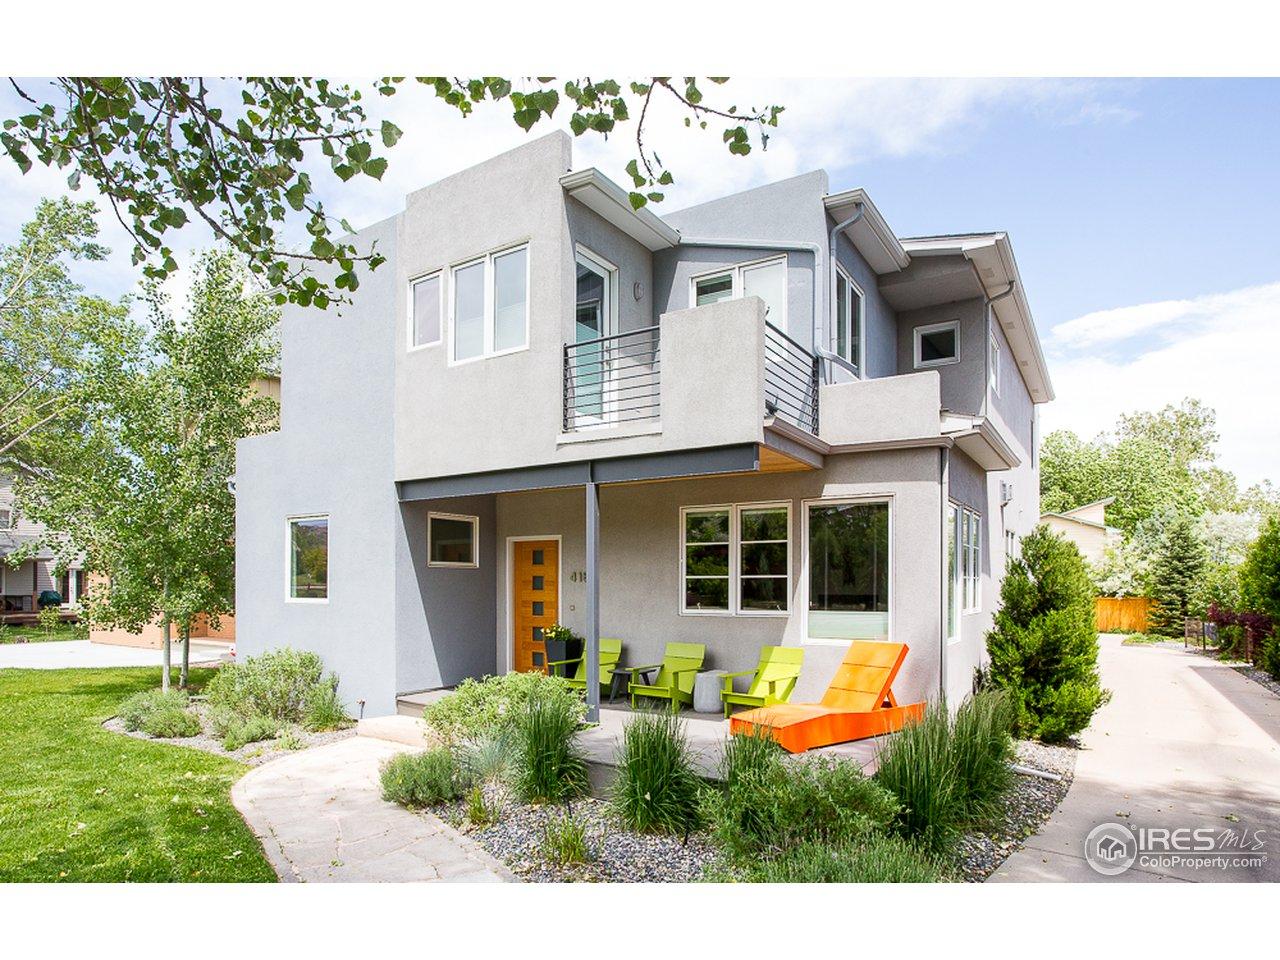 4160 17th St, Boulder CO 80304